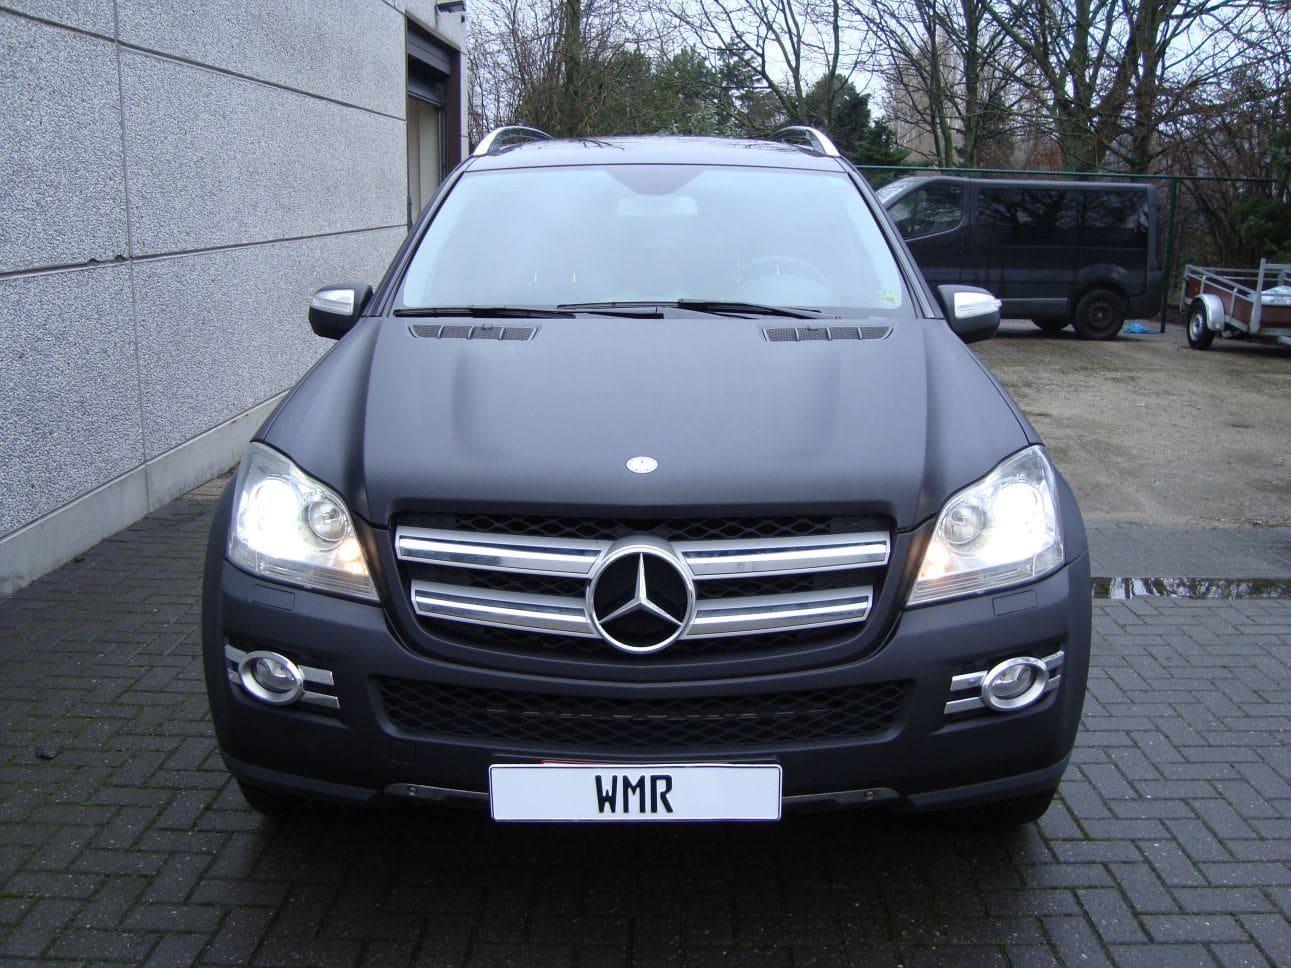 Mercedes GL met Mat Zwarte Wrap, Carwrapping door Wrapmyride.nu Foto-nr:6279, ©2021